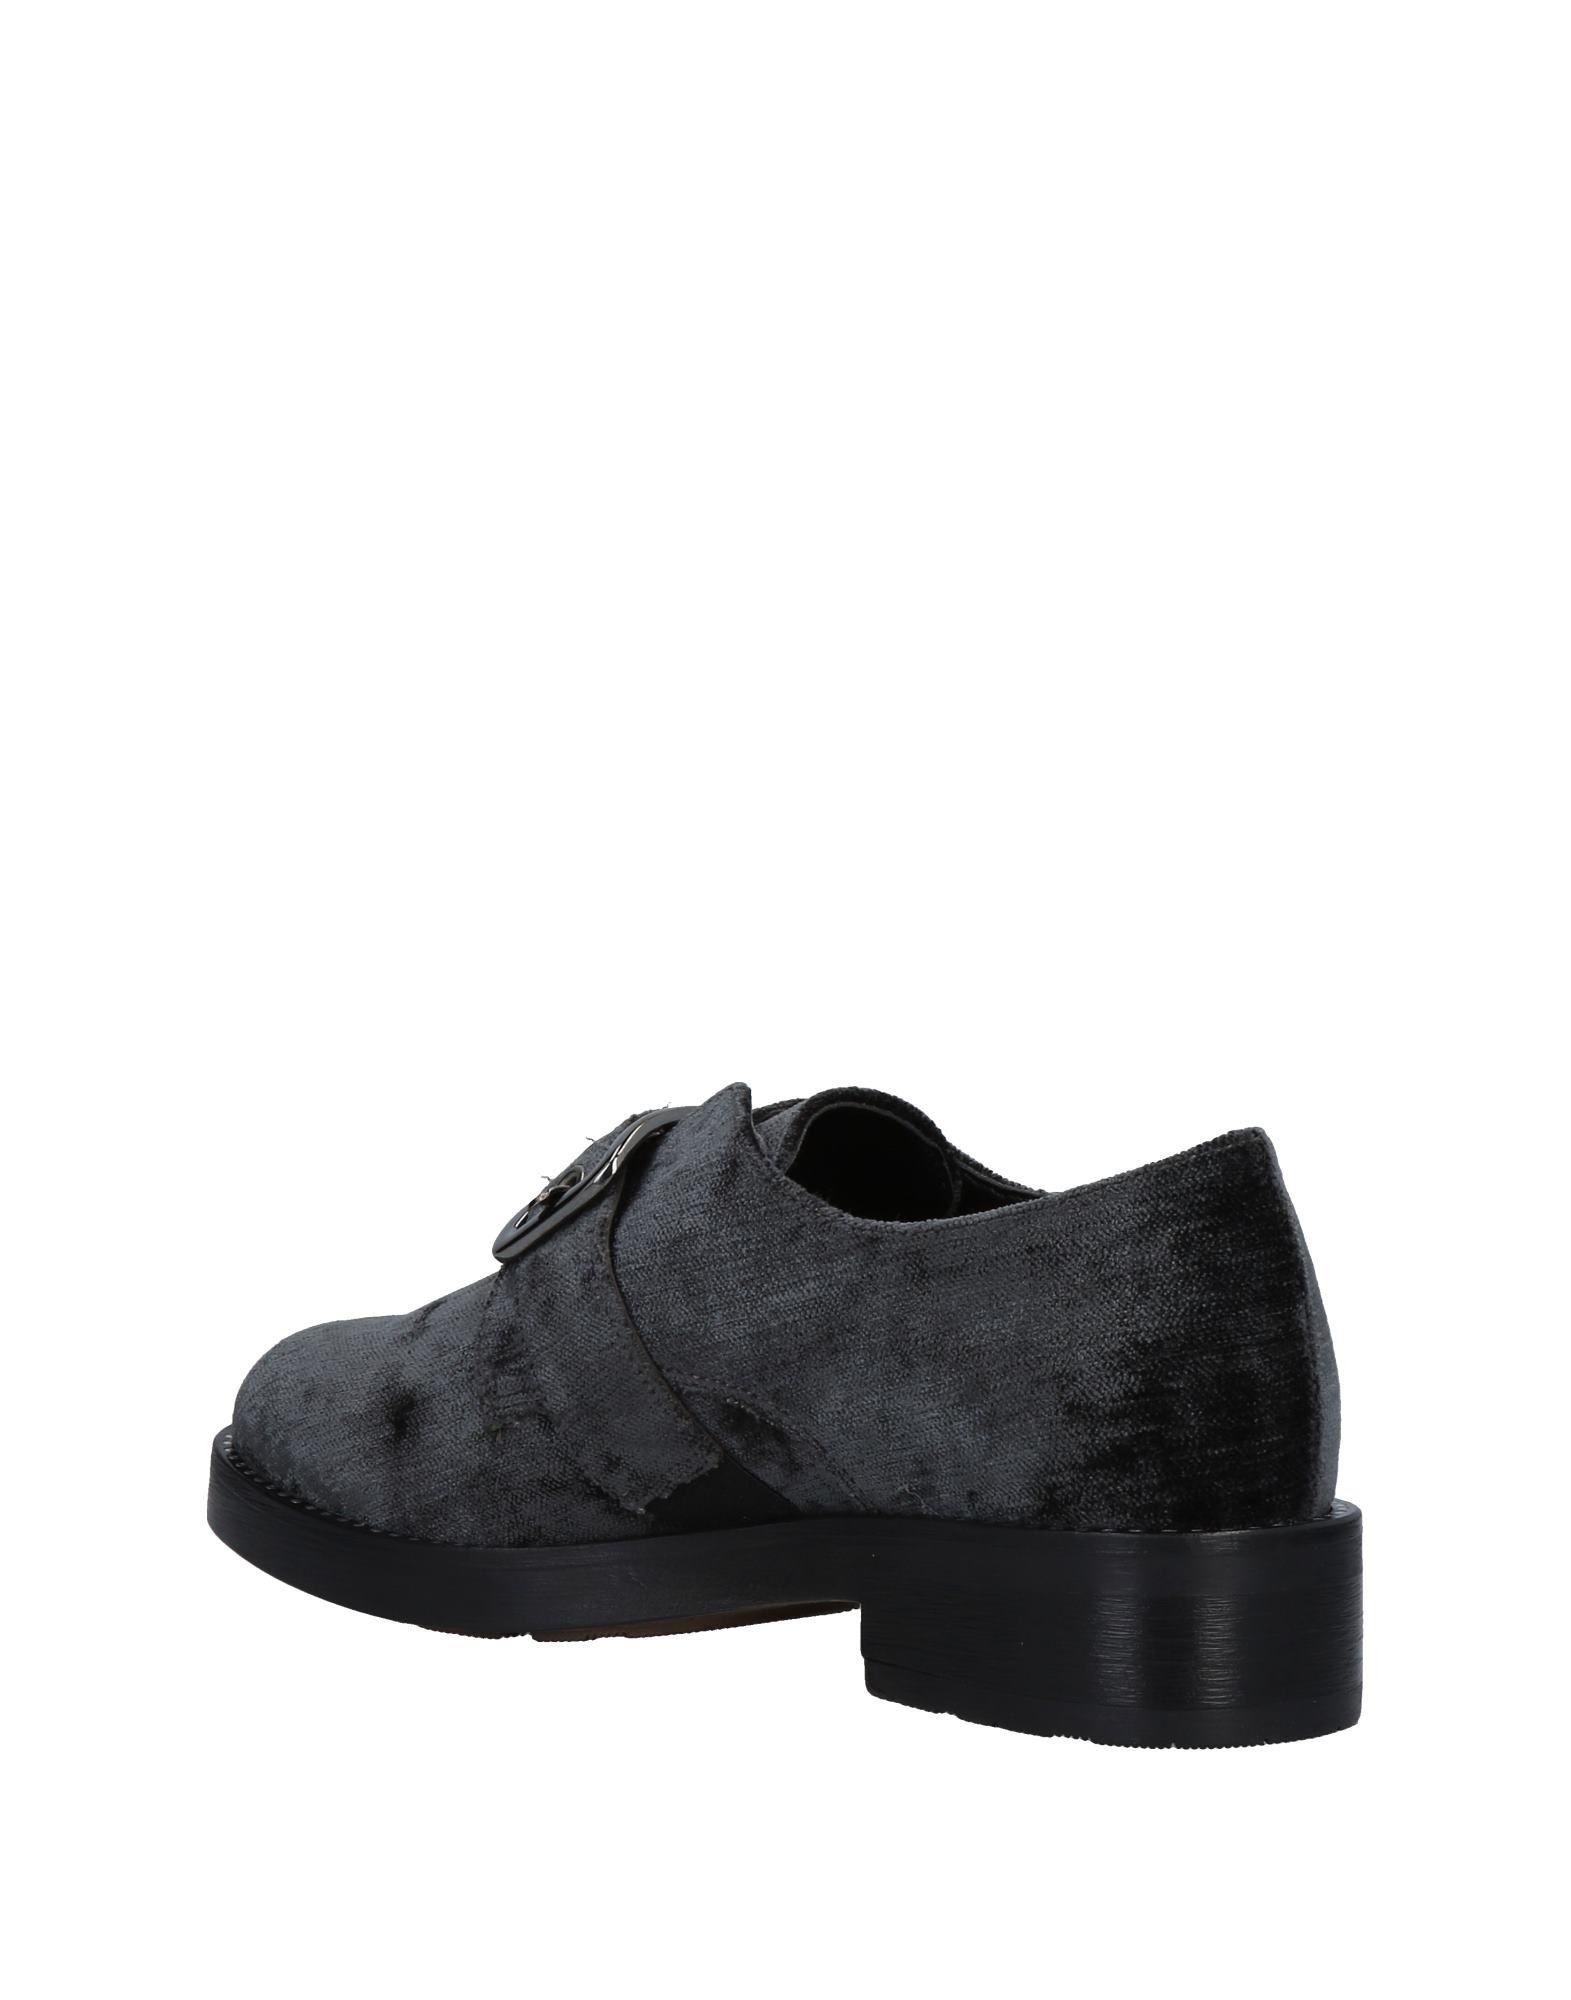 Formentini Schnürschuhe Damen Qualität 11479012TP Gute Qualität Damen beliebte Schuhe d854f0